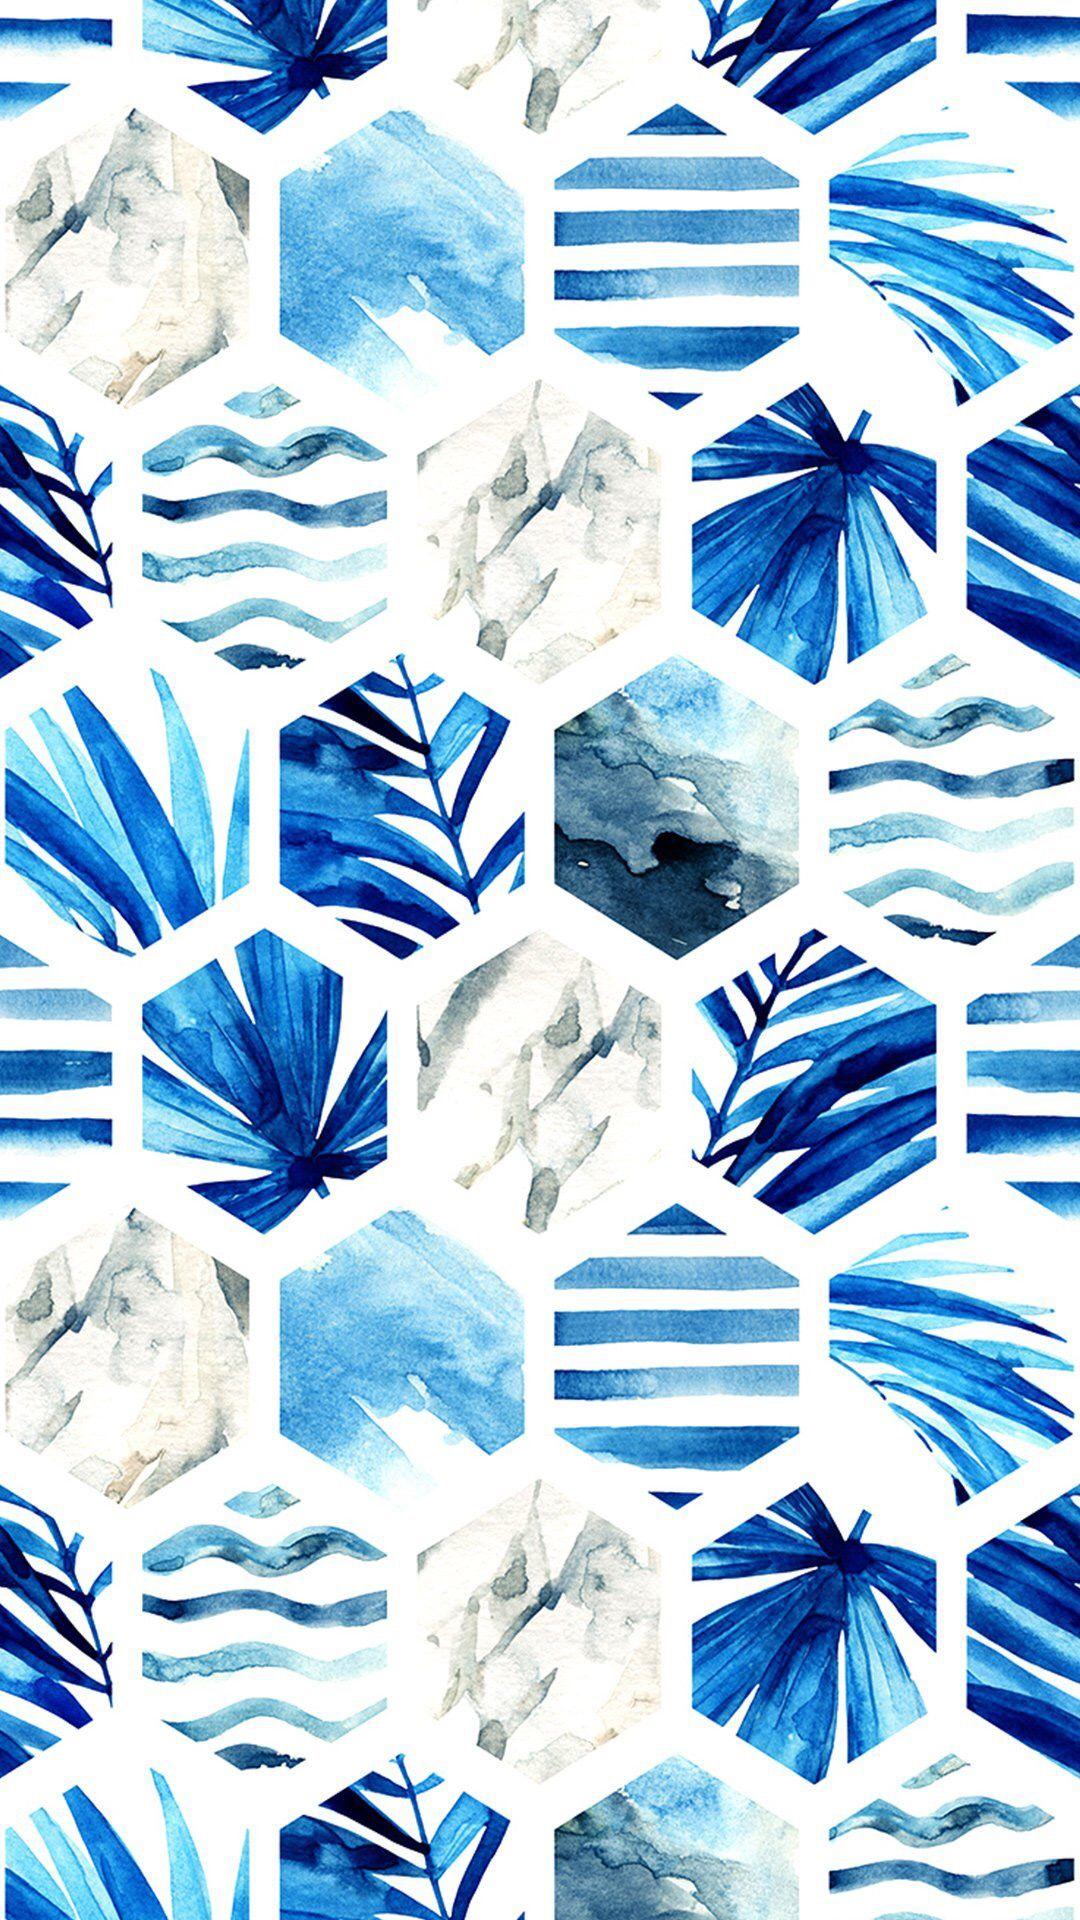 iPhone Wall tjn | iPhone Walls 4 | Iphone wallpaper, Wallpaper, Pattern wallpaper